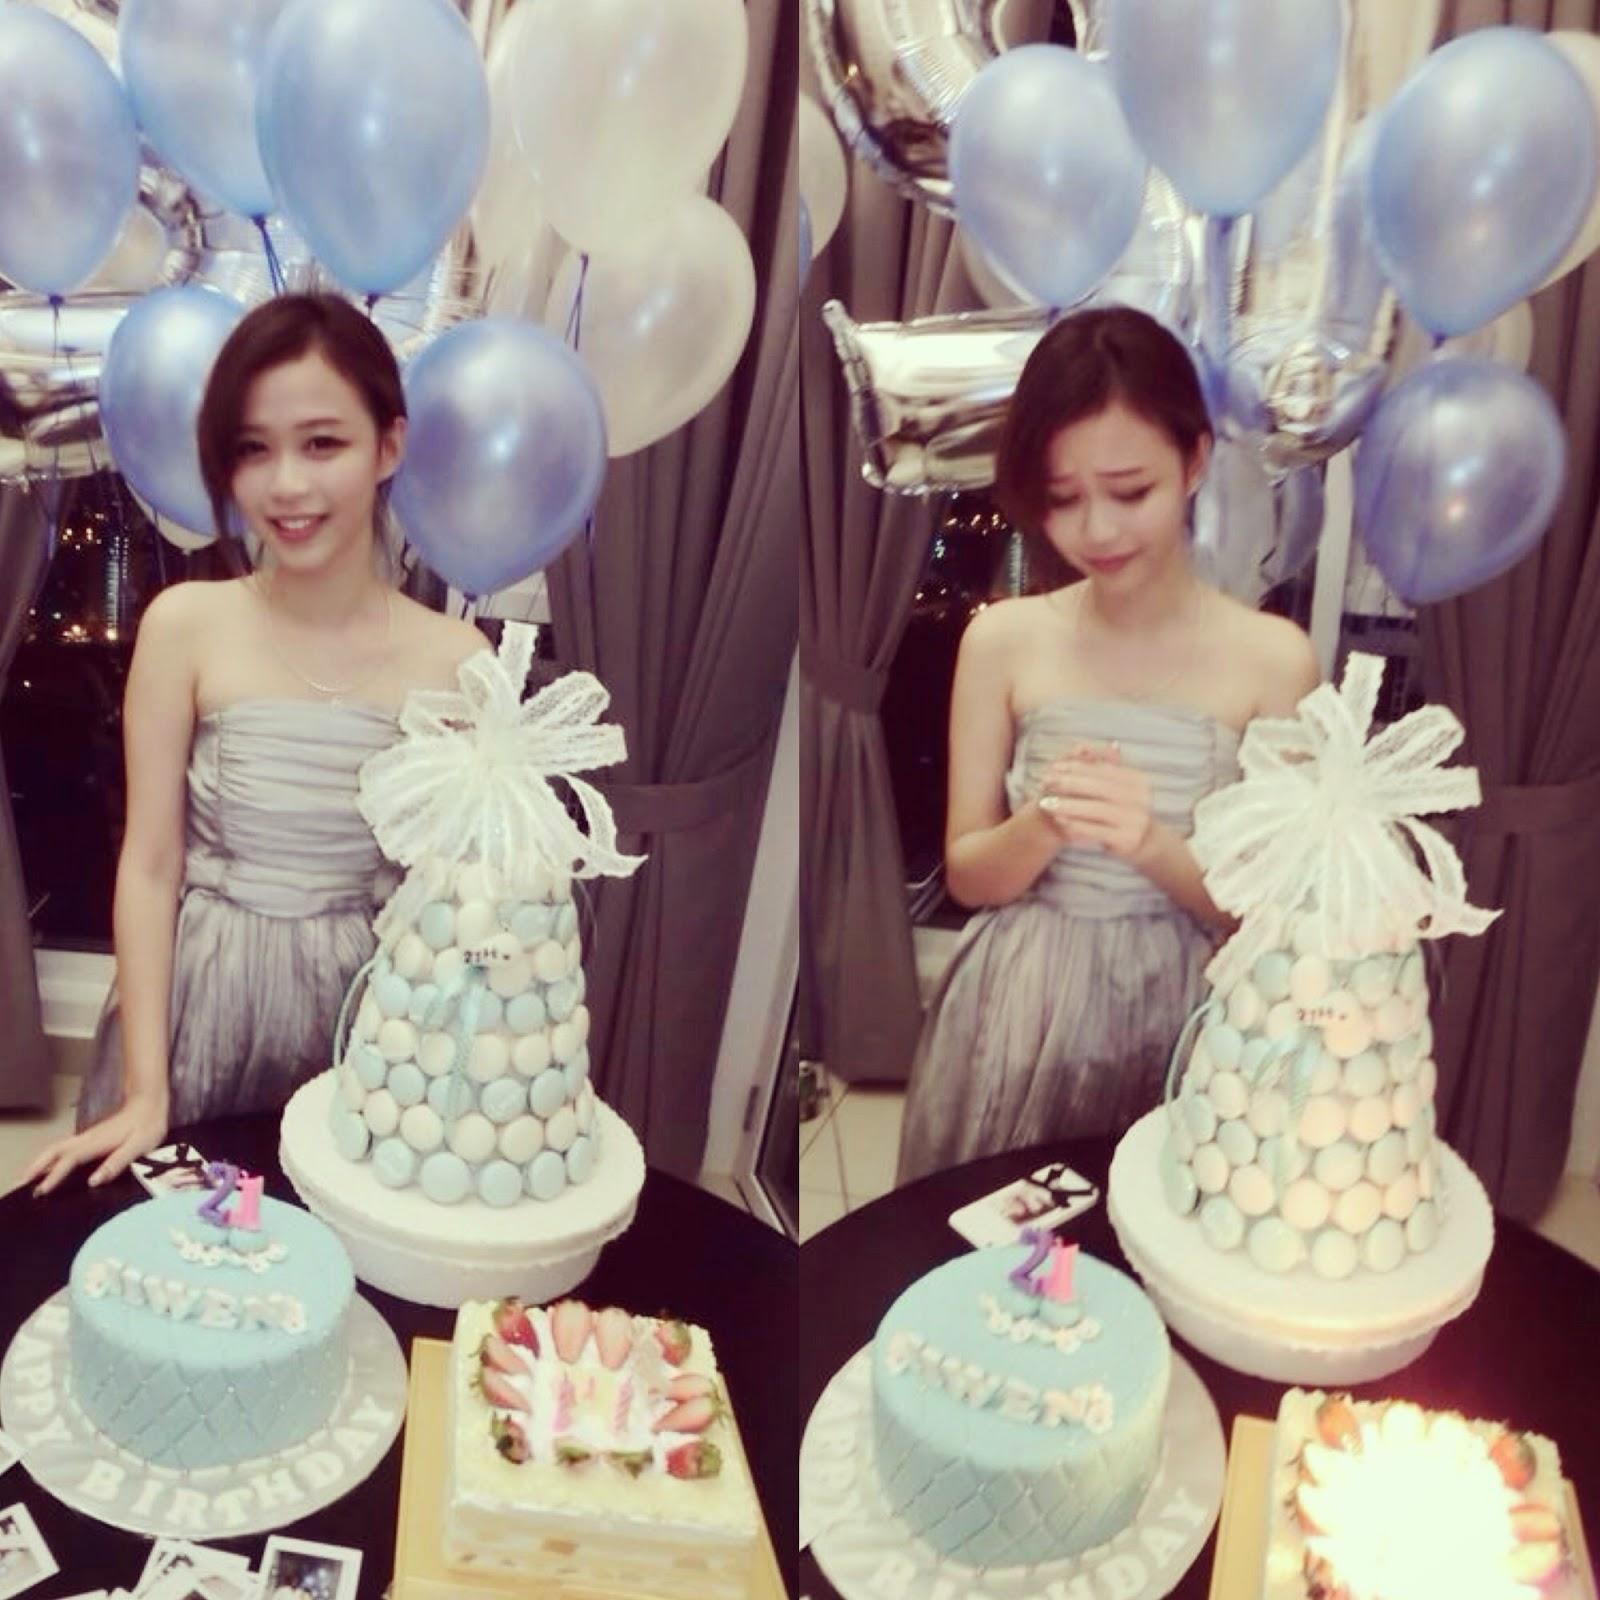 Iiwen Tan's Blog: My 21st Birthday Celebration